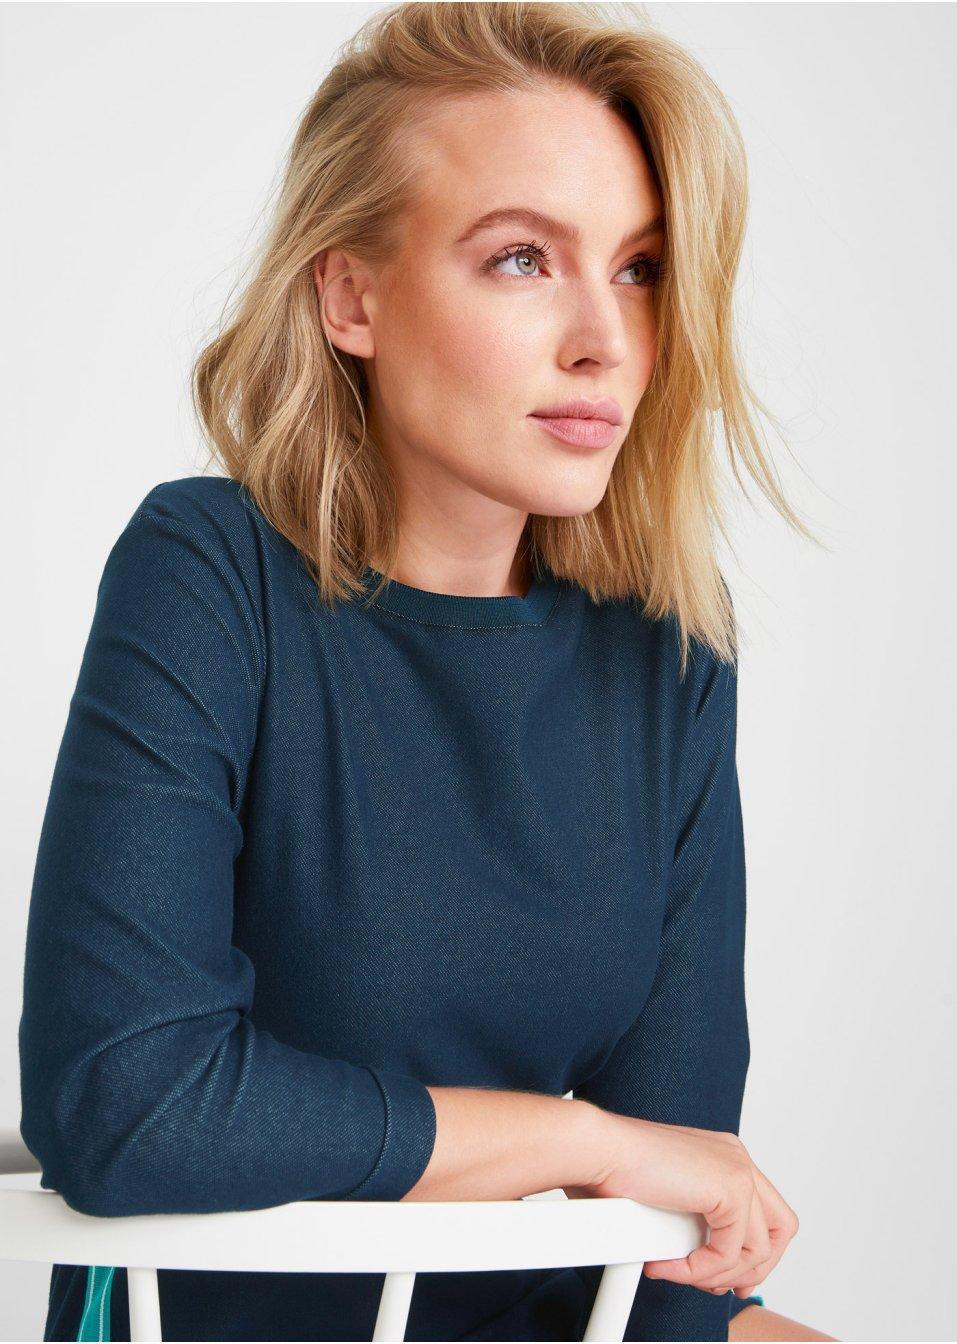 Mode Femme Vêtements DJLfdOFlkj Robe sweat imitation jean, manches 3/4 bleu Femme John Baner JEANSWEAR .fr